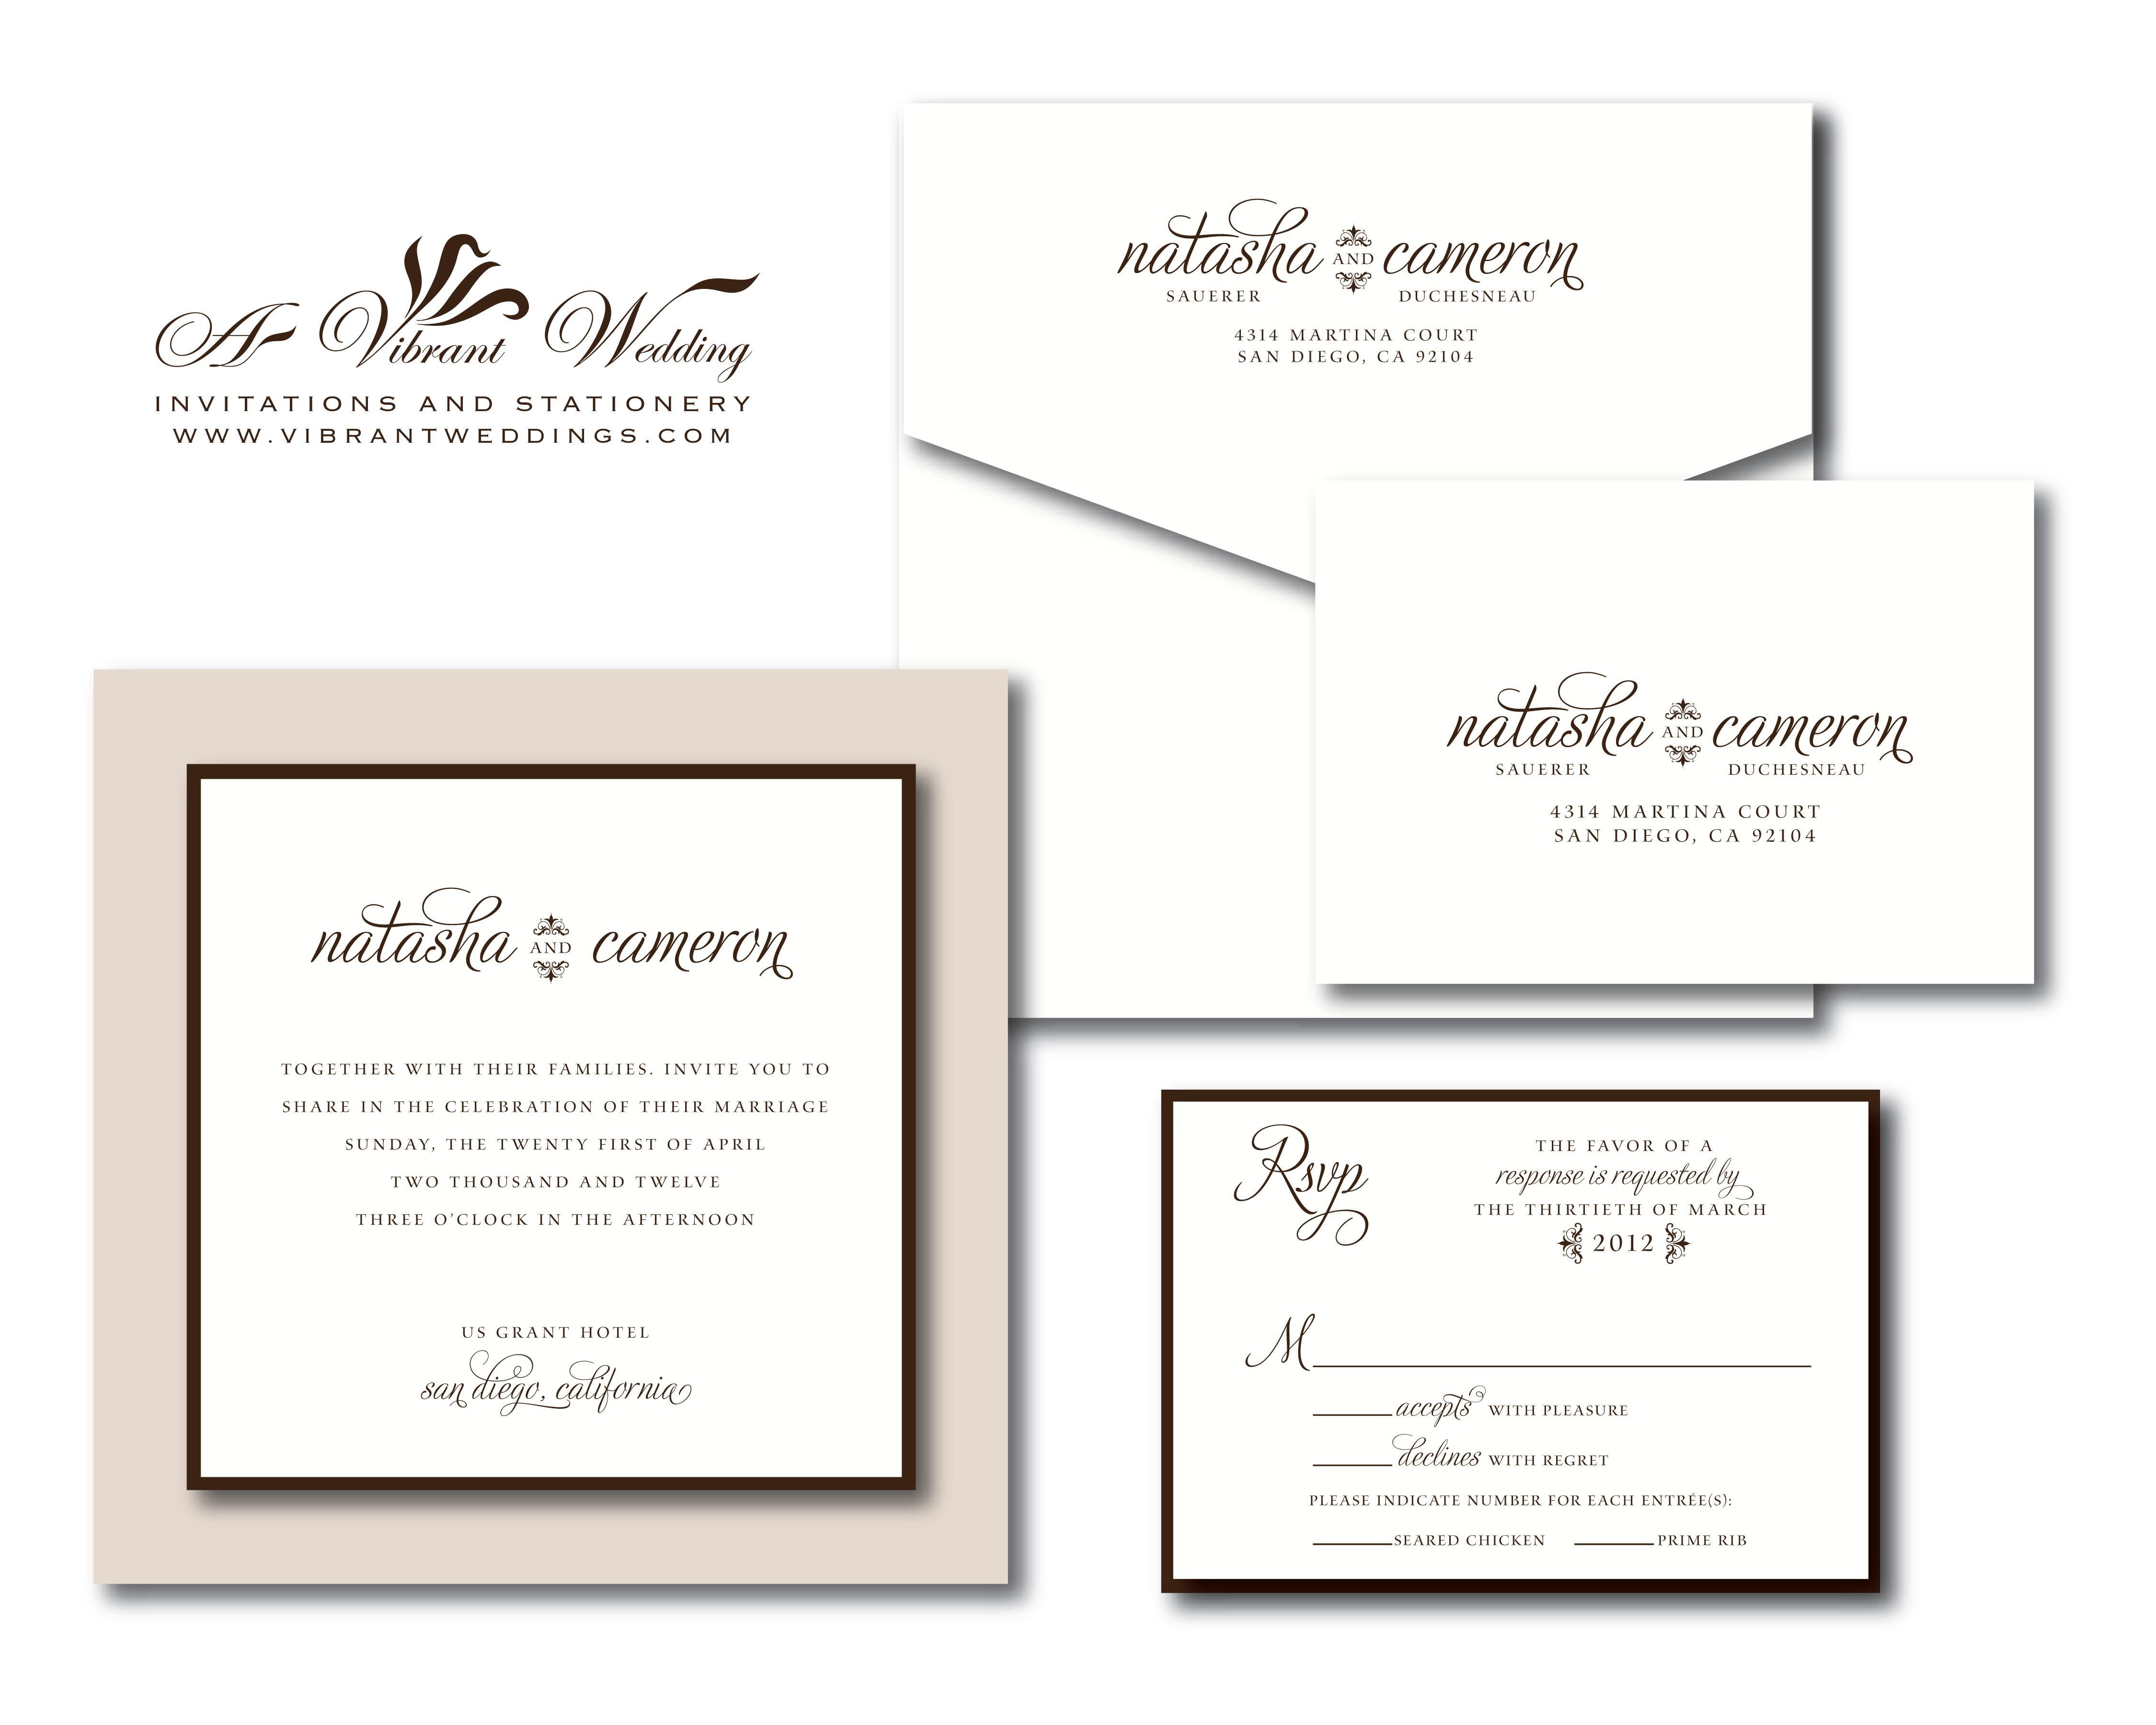 modern wedding invitations – A Vibrant Wedding